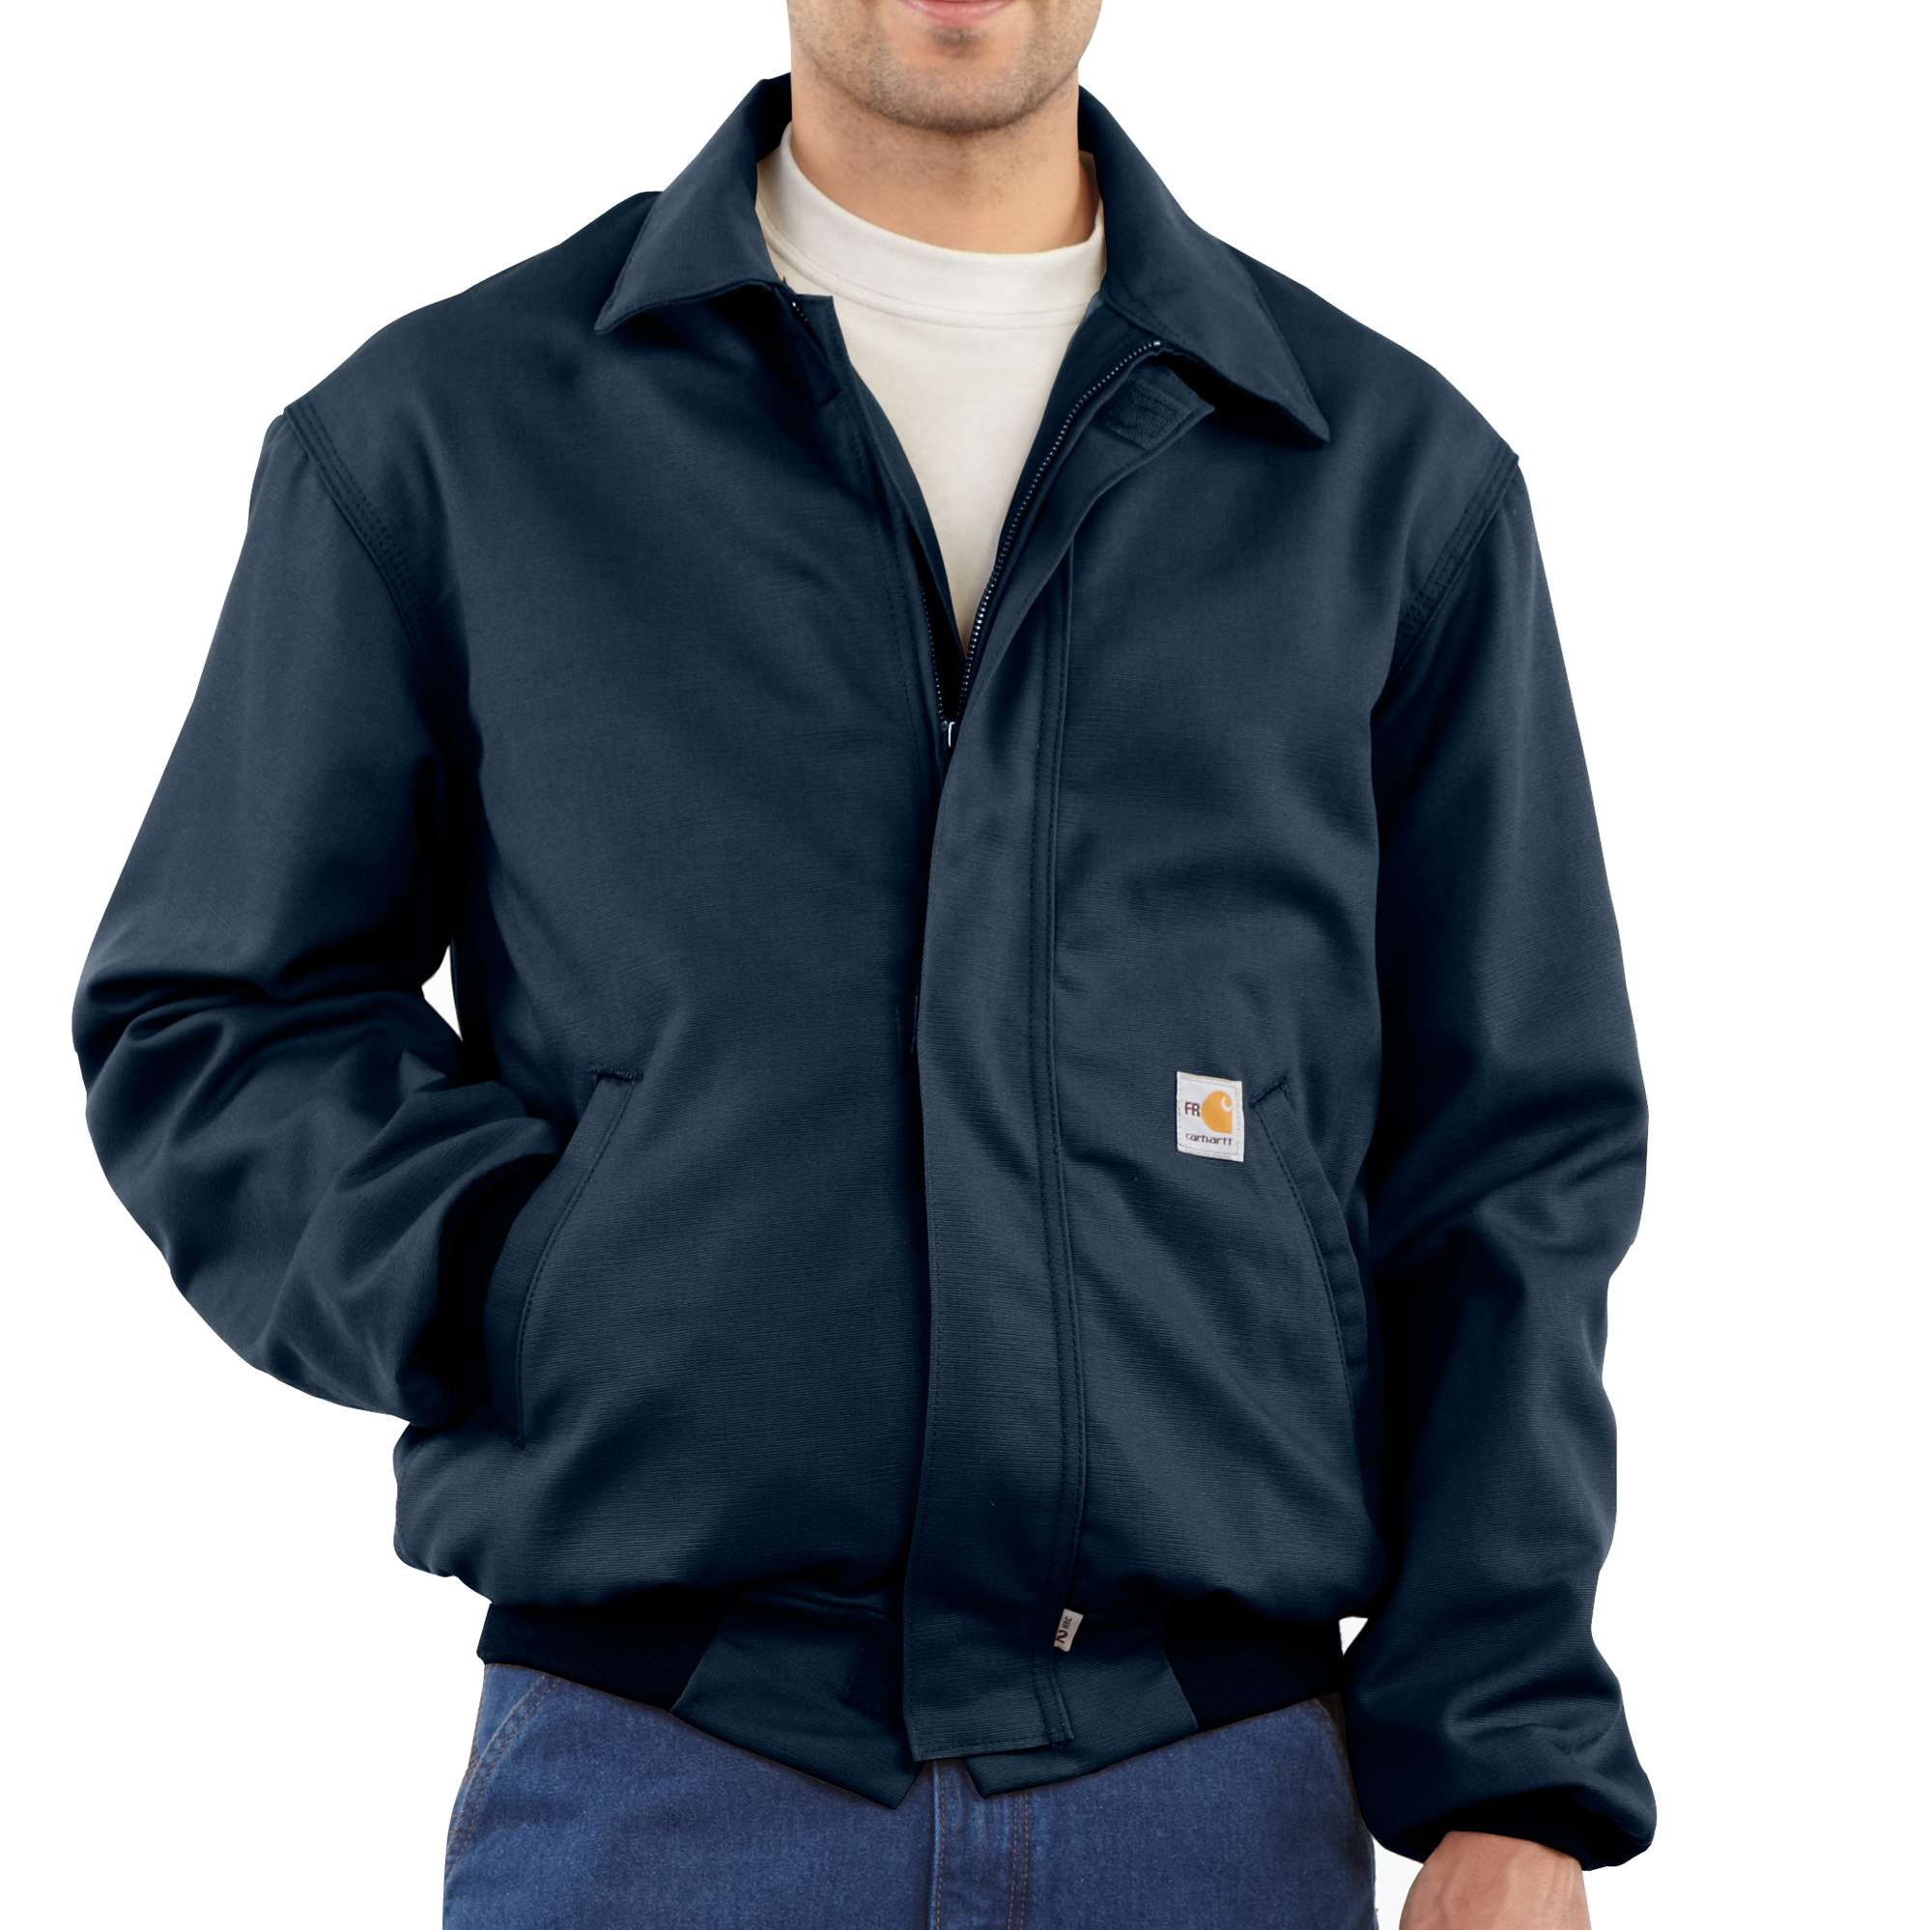 Carhartt Flame-resistant All-season Bomber Jacket